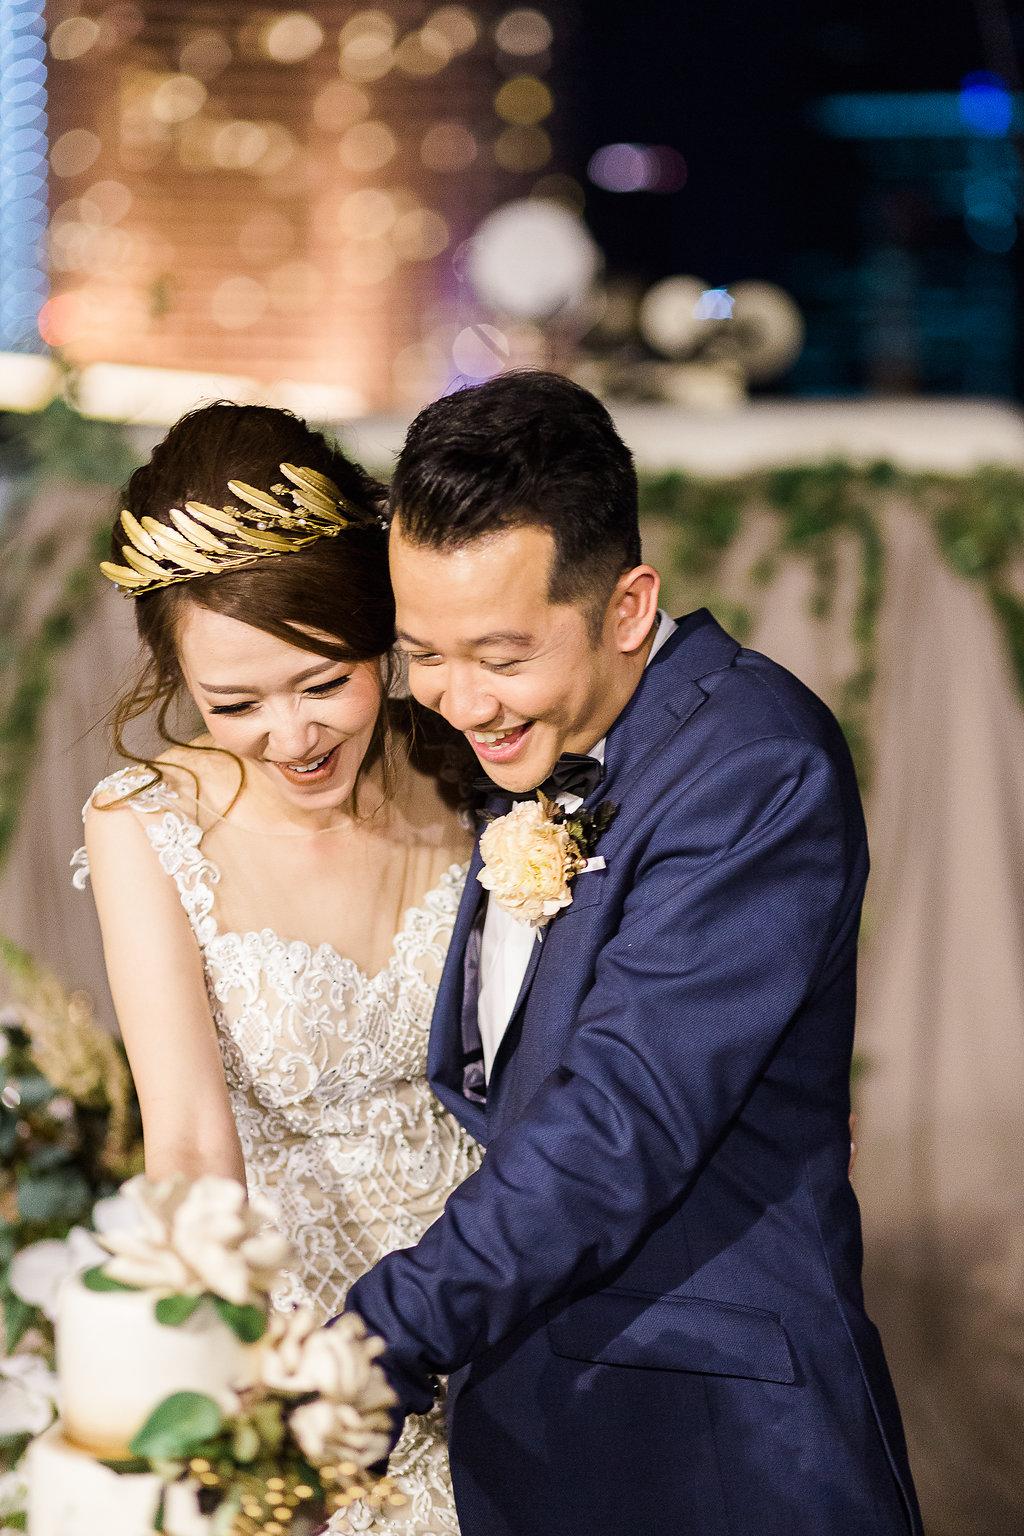 Luxe destination wedding in Jakarta and Bankok | fine art film wedding photographer Tanja Kibogo 4007.JPG